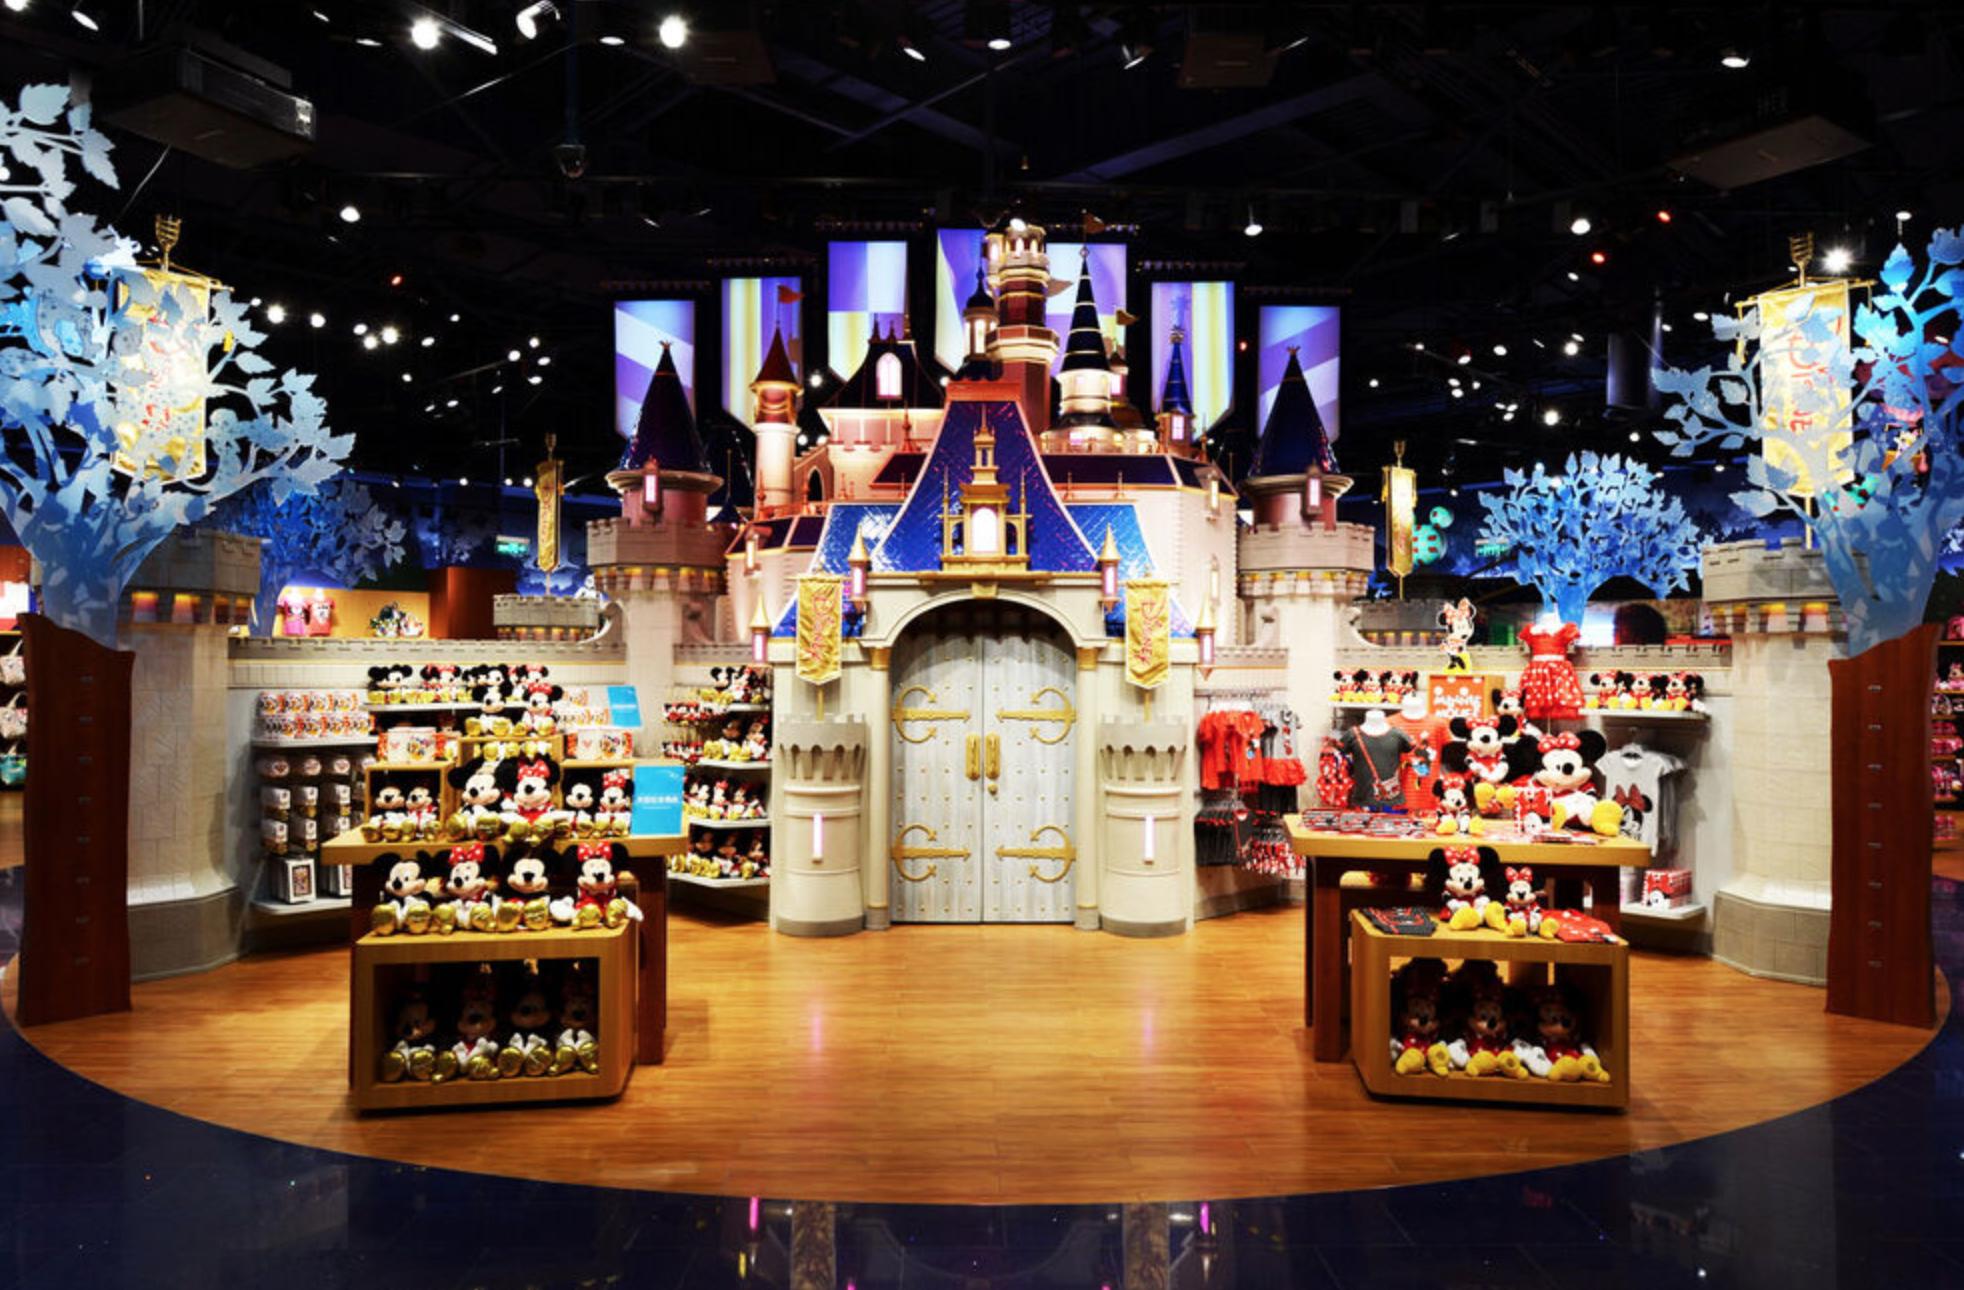 Disney Store [Source: WikiWand]